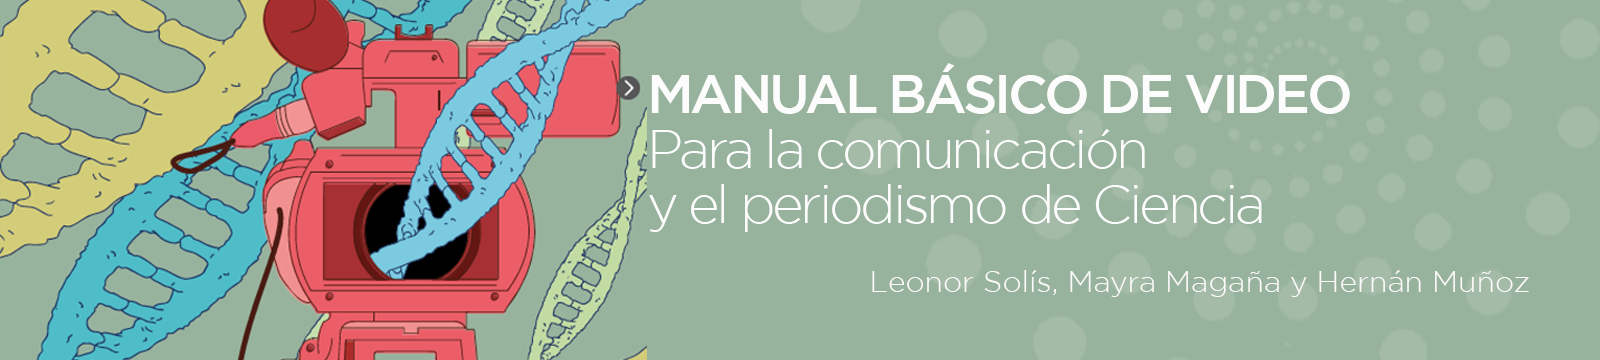 Banner Manual Video